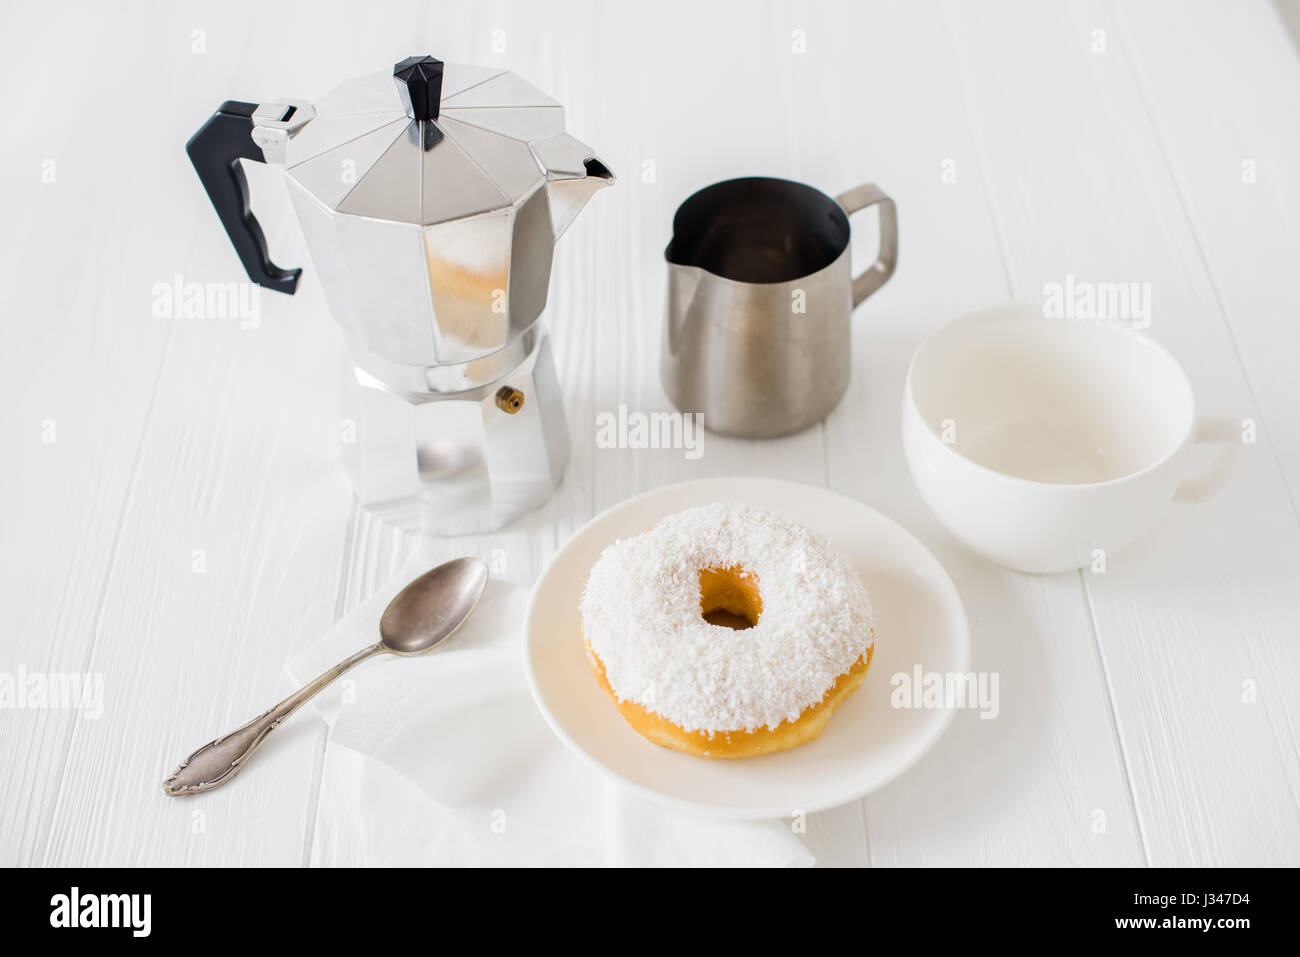 Elegant white breakfast table setting coffee cup and donut close-up & Elegant white breakfast table setting coffee cup and donut close-up ...